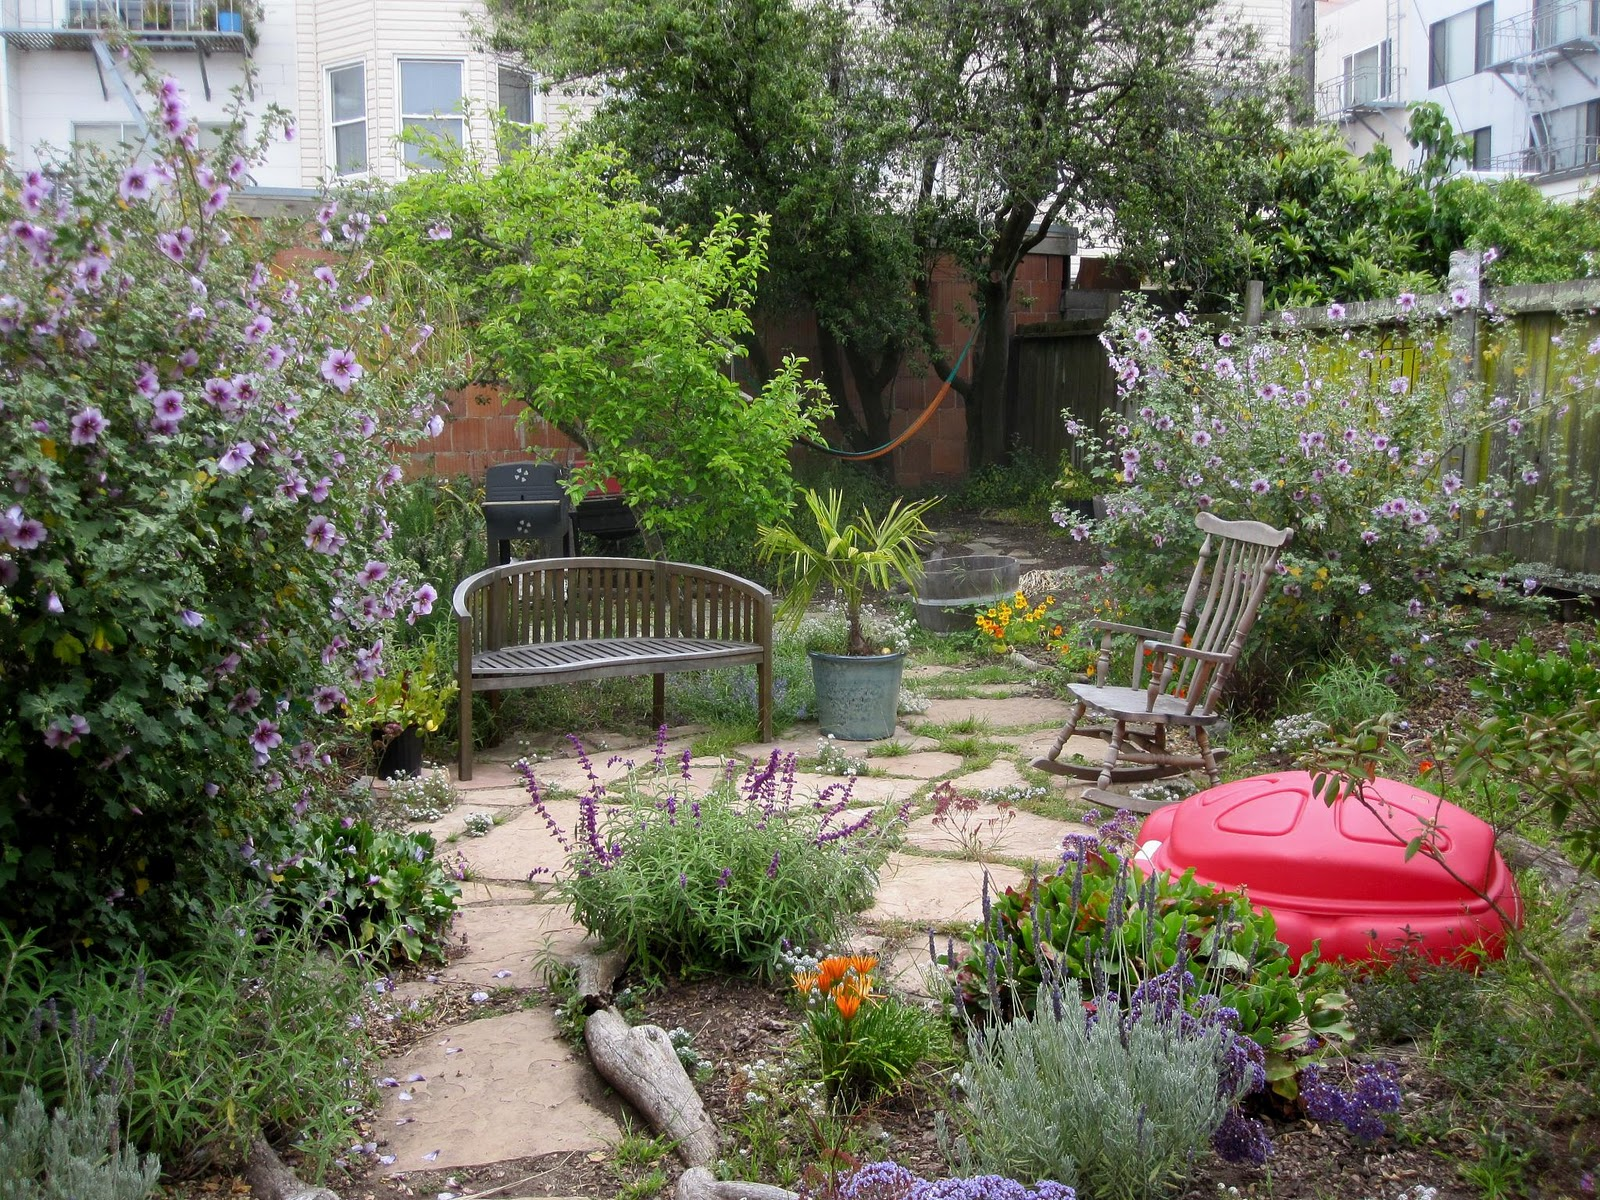 Backyard Garden Design Ideas - HomesFeed on Backyard Garden Ideas id=52587